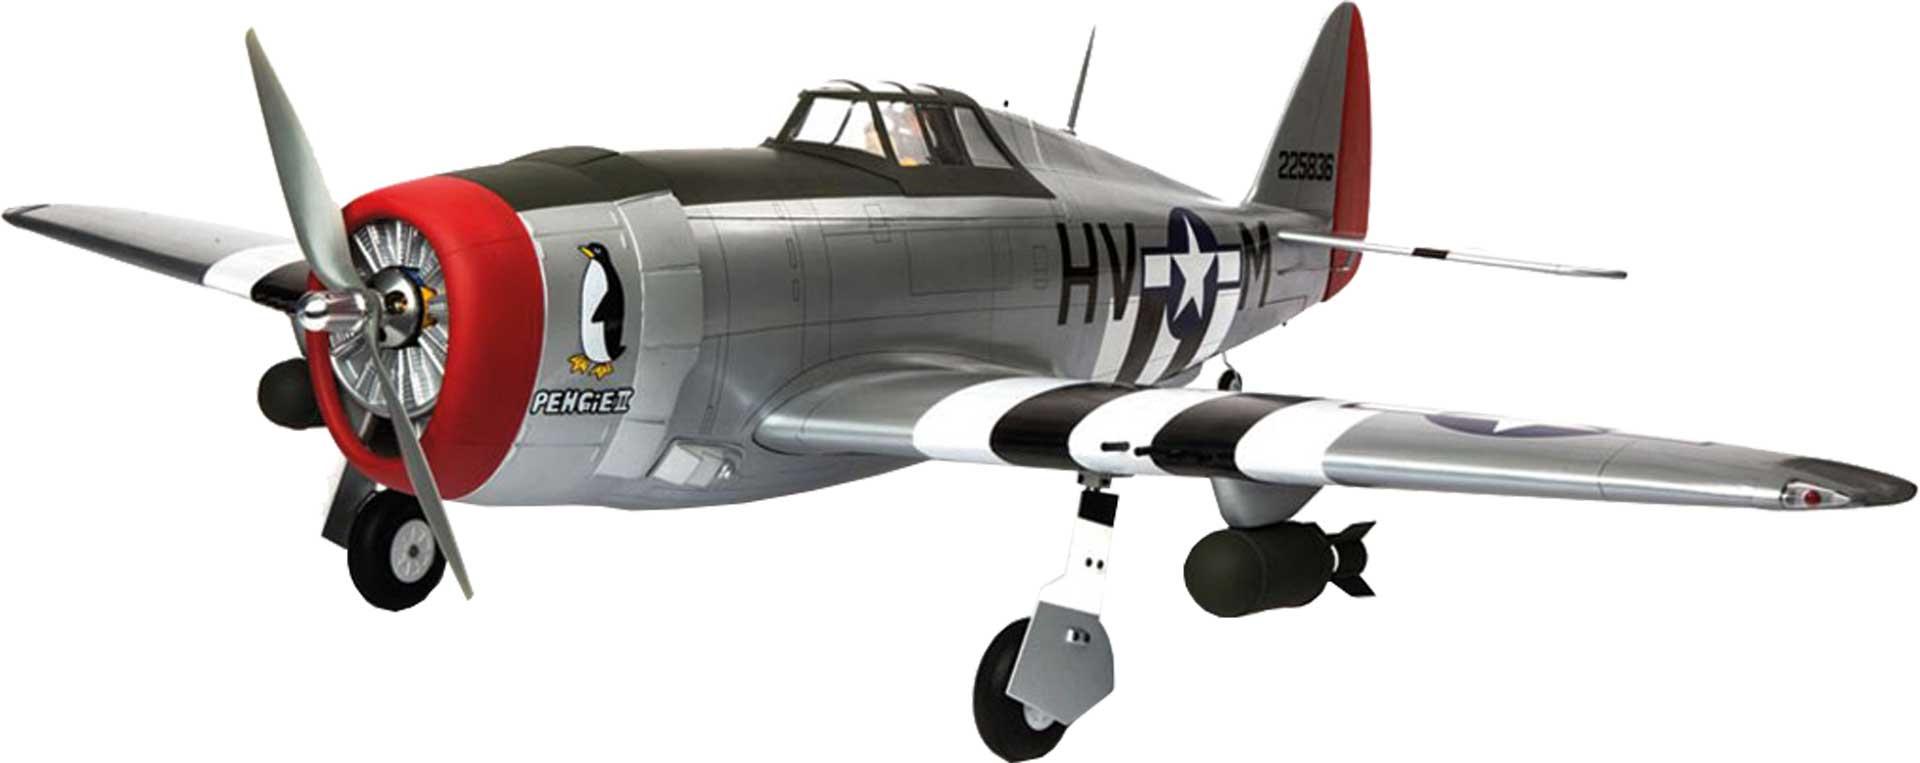 HANGAR 9 P-47D THUNDERBOLT 20CC ARF WARBIRD